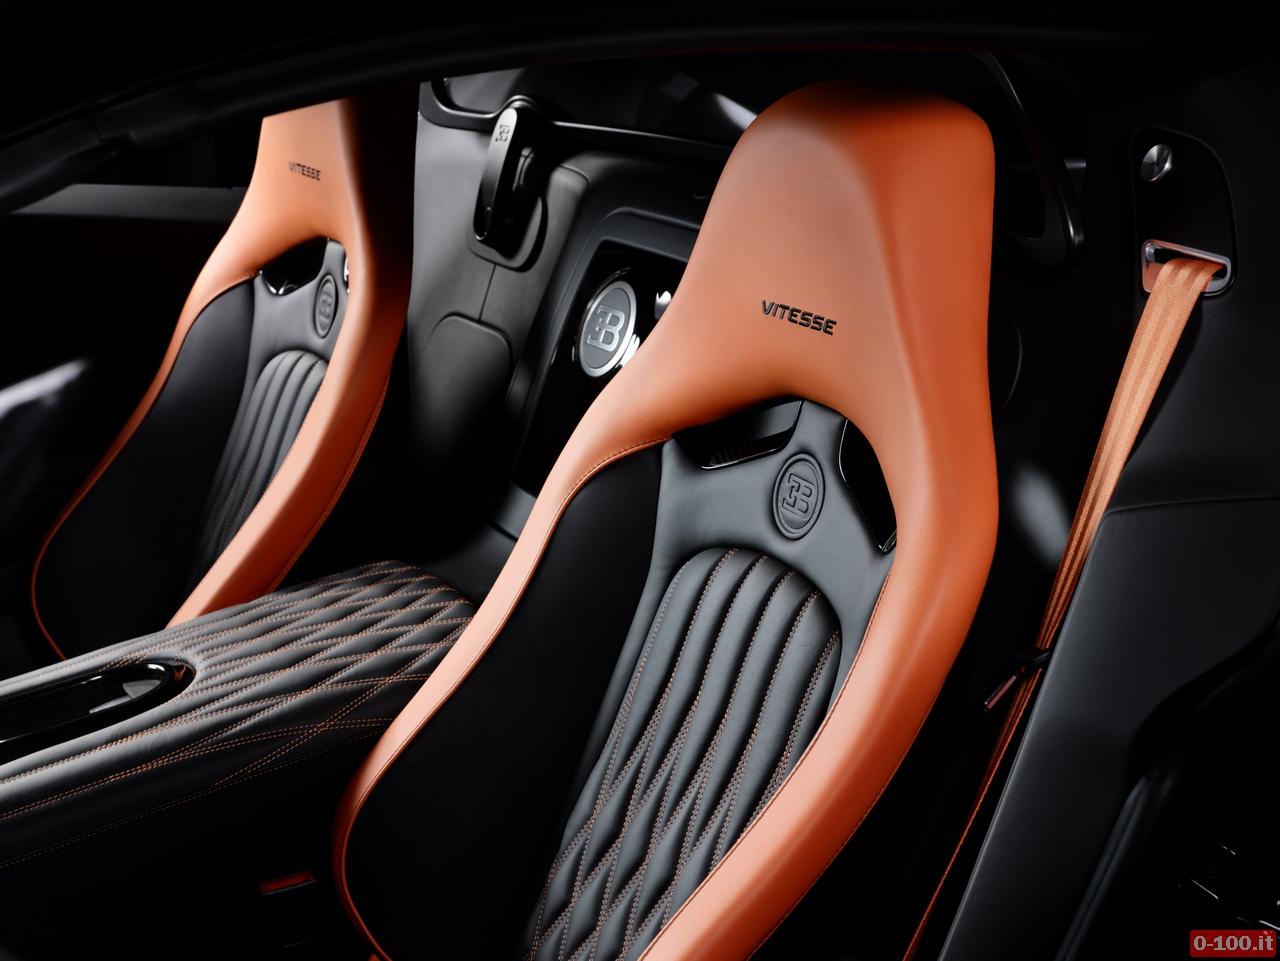 bugatti-veyron-16-4-grand-sport-vitesse-debutto-a-shanghai_0-100_11